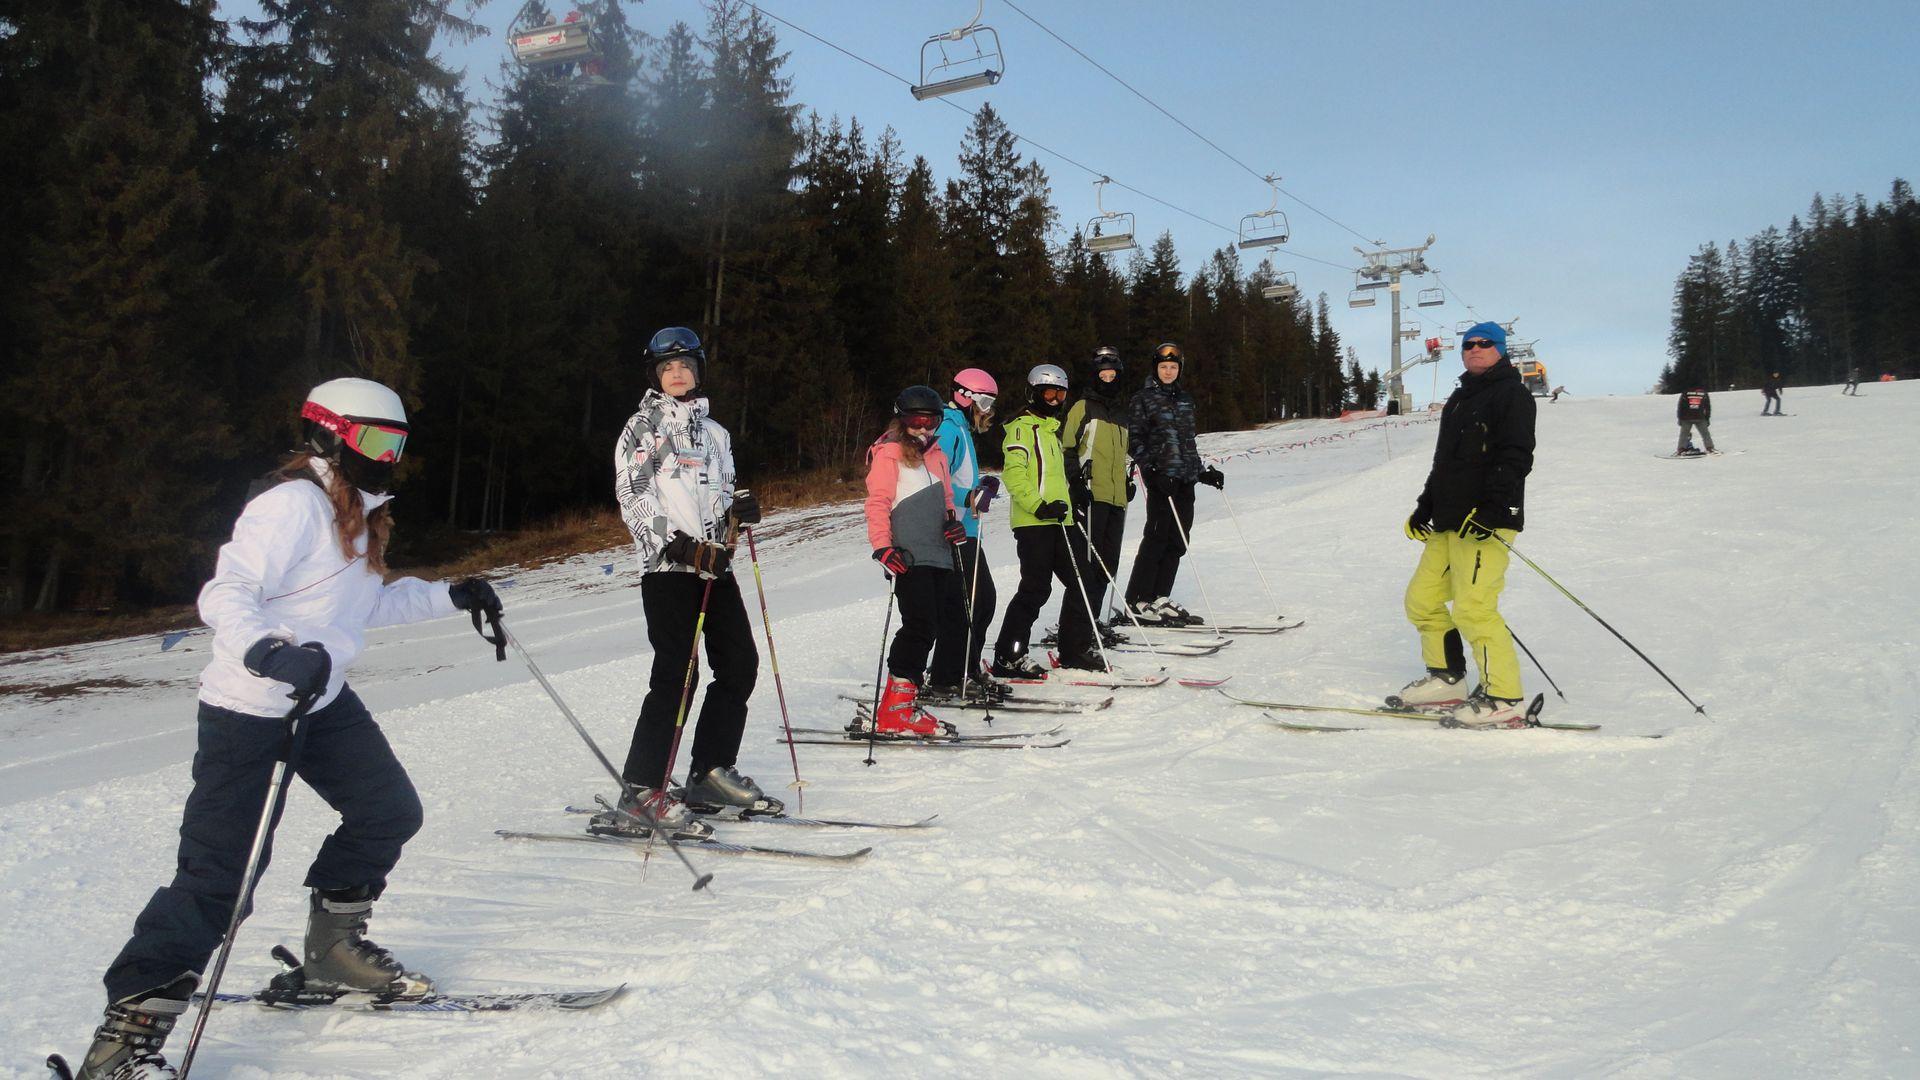 CarTourist_narty-snowboard_2014-foto-10